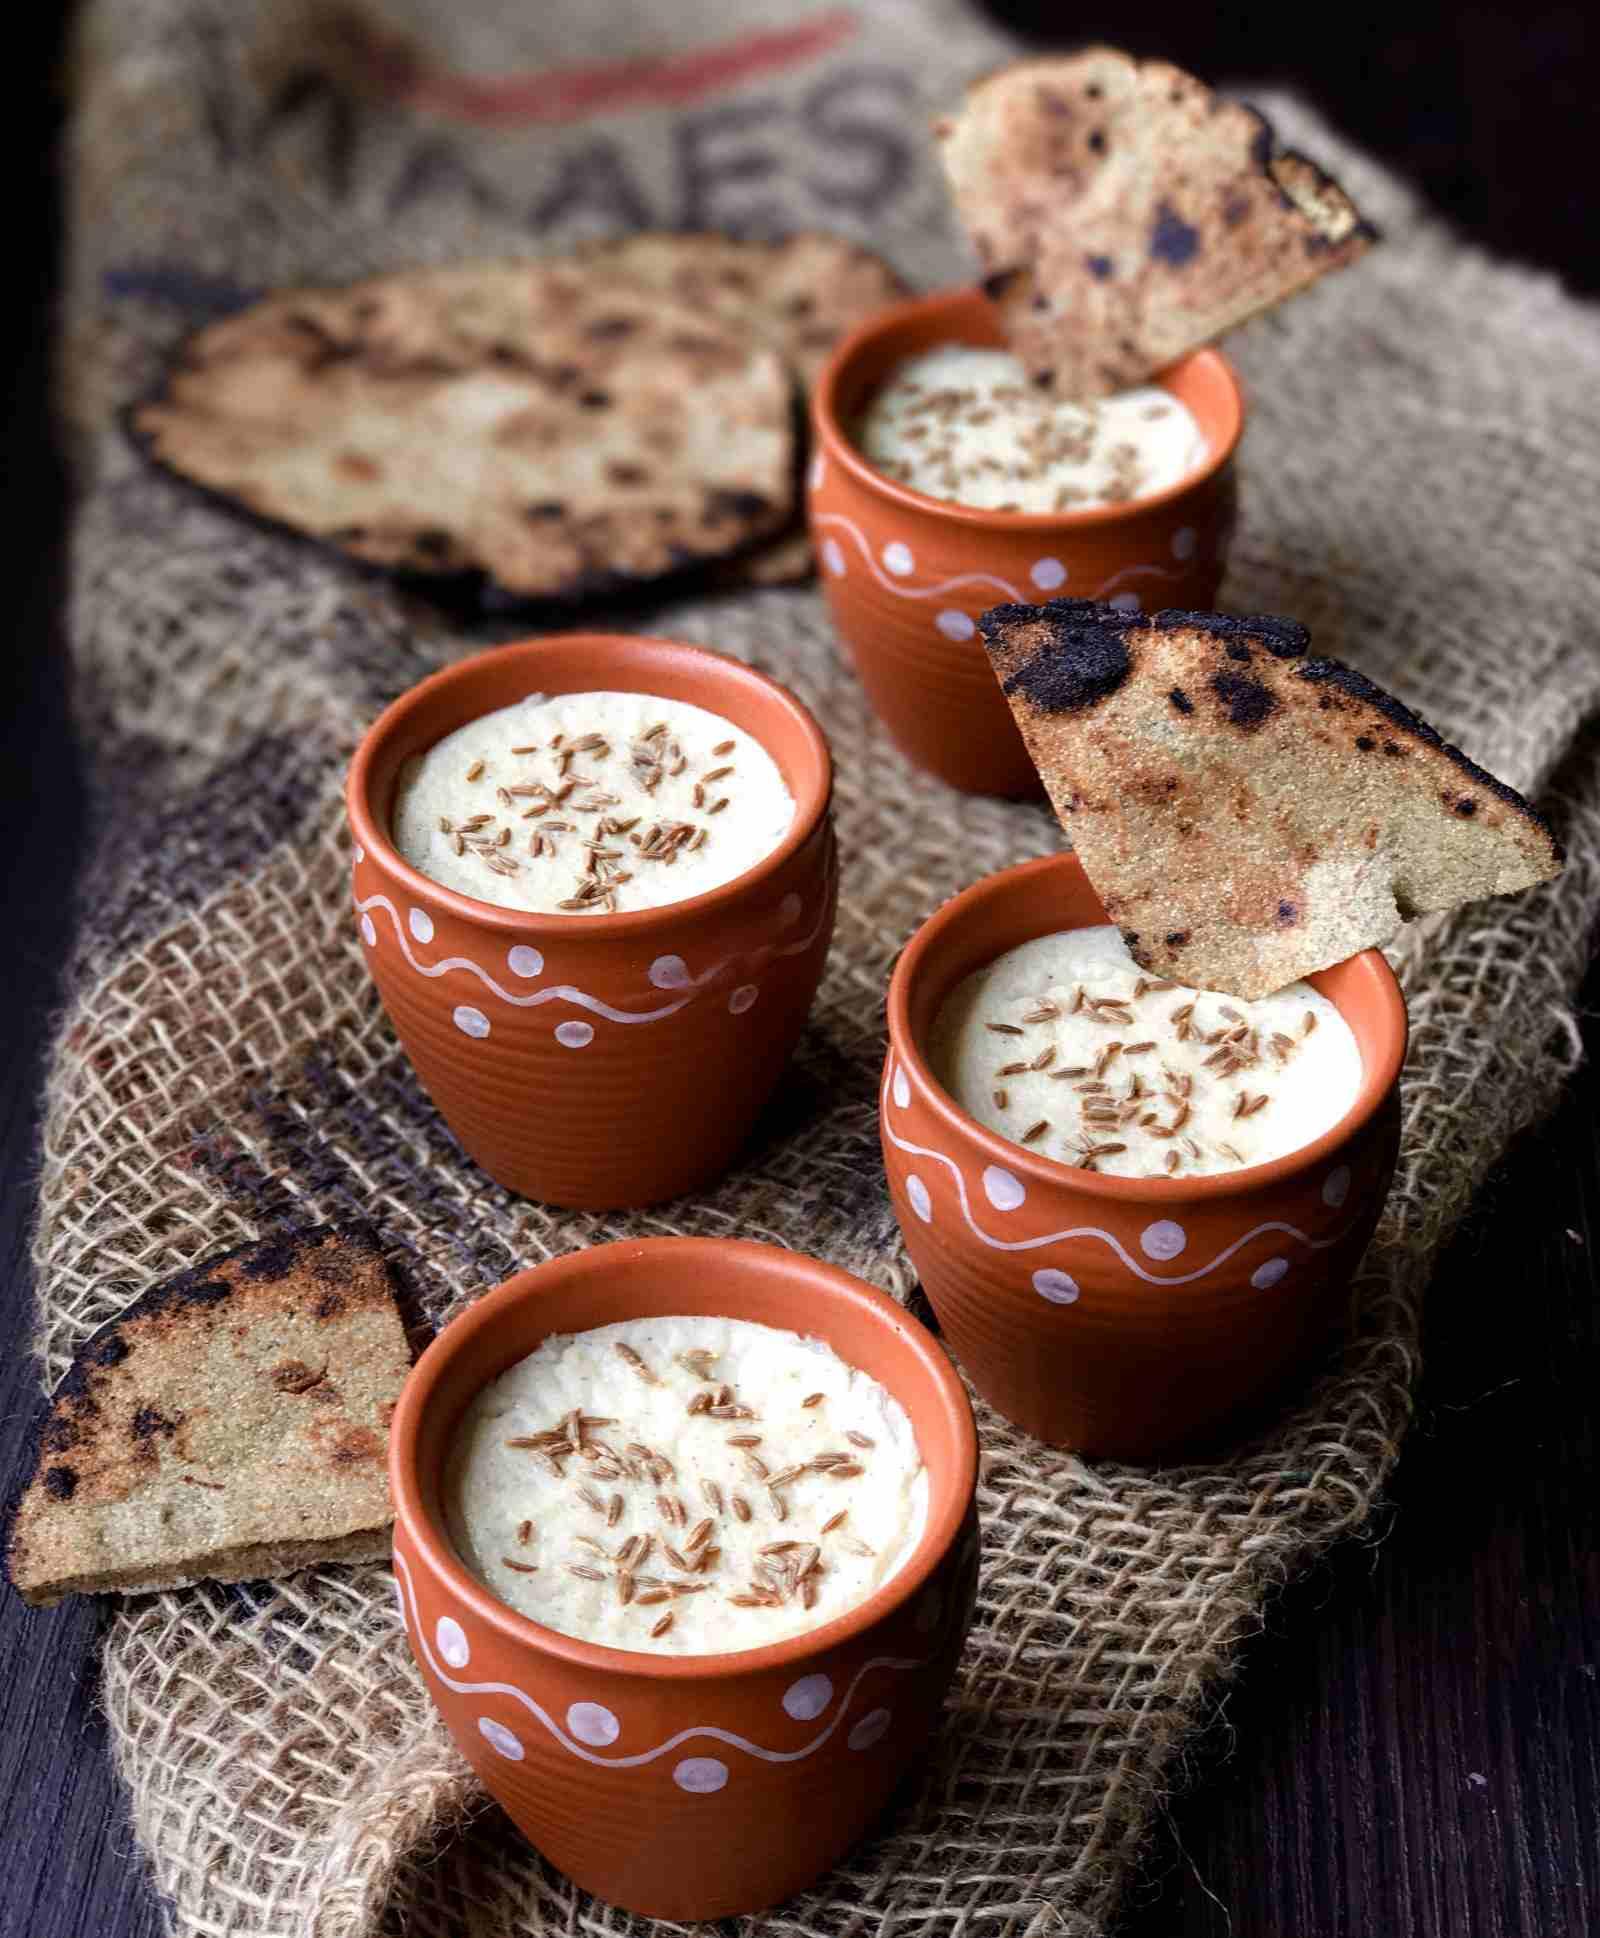 Rajasthani bajre ki khatti raabdi recipe by archanas kitchen rajasthani bajre ki khatti raabdi recipe forumfinder Choice Image